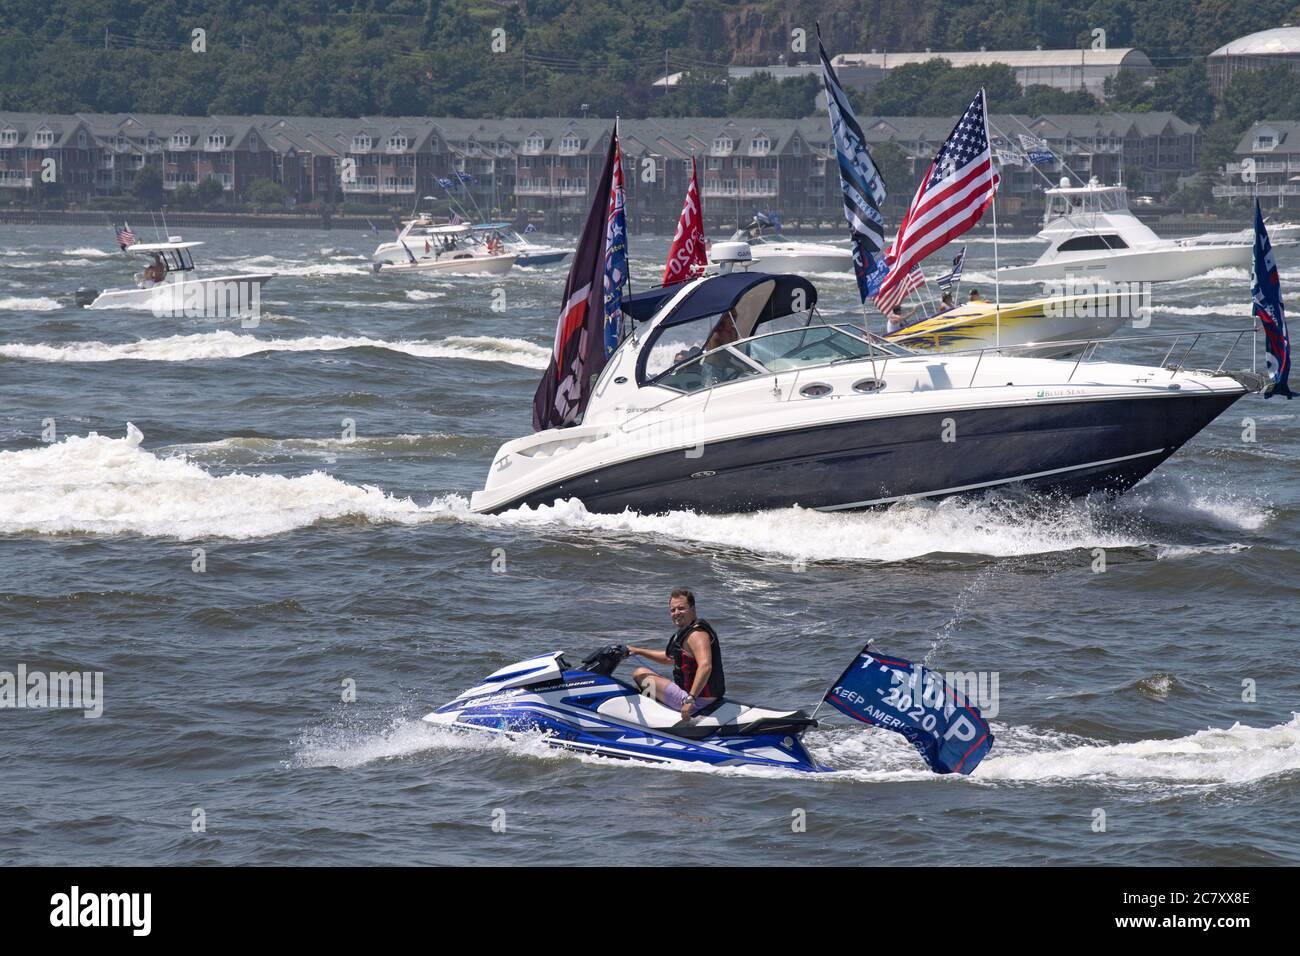 New York Ny July 19 2020 A Huge Flotilla Of Boats And Jetski Displaying Trump 2020 Flags Make Their Way Up Manhattan S Hudson River Trumpstock Stock Photo Alamy